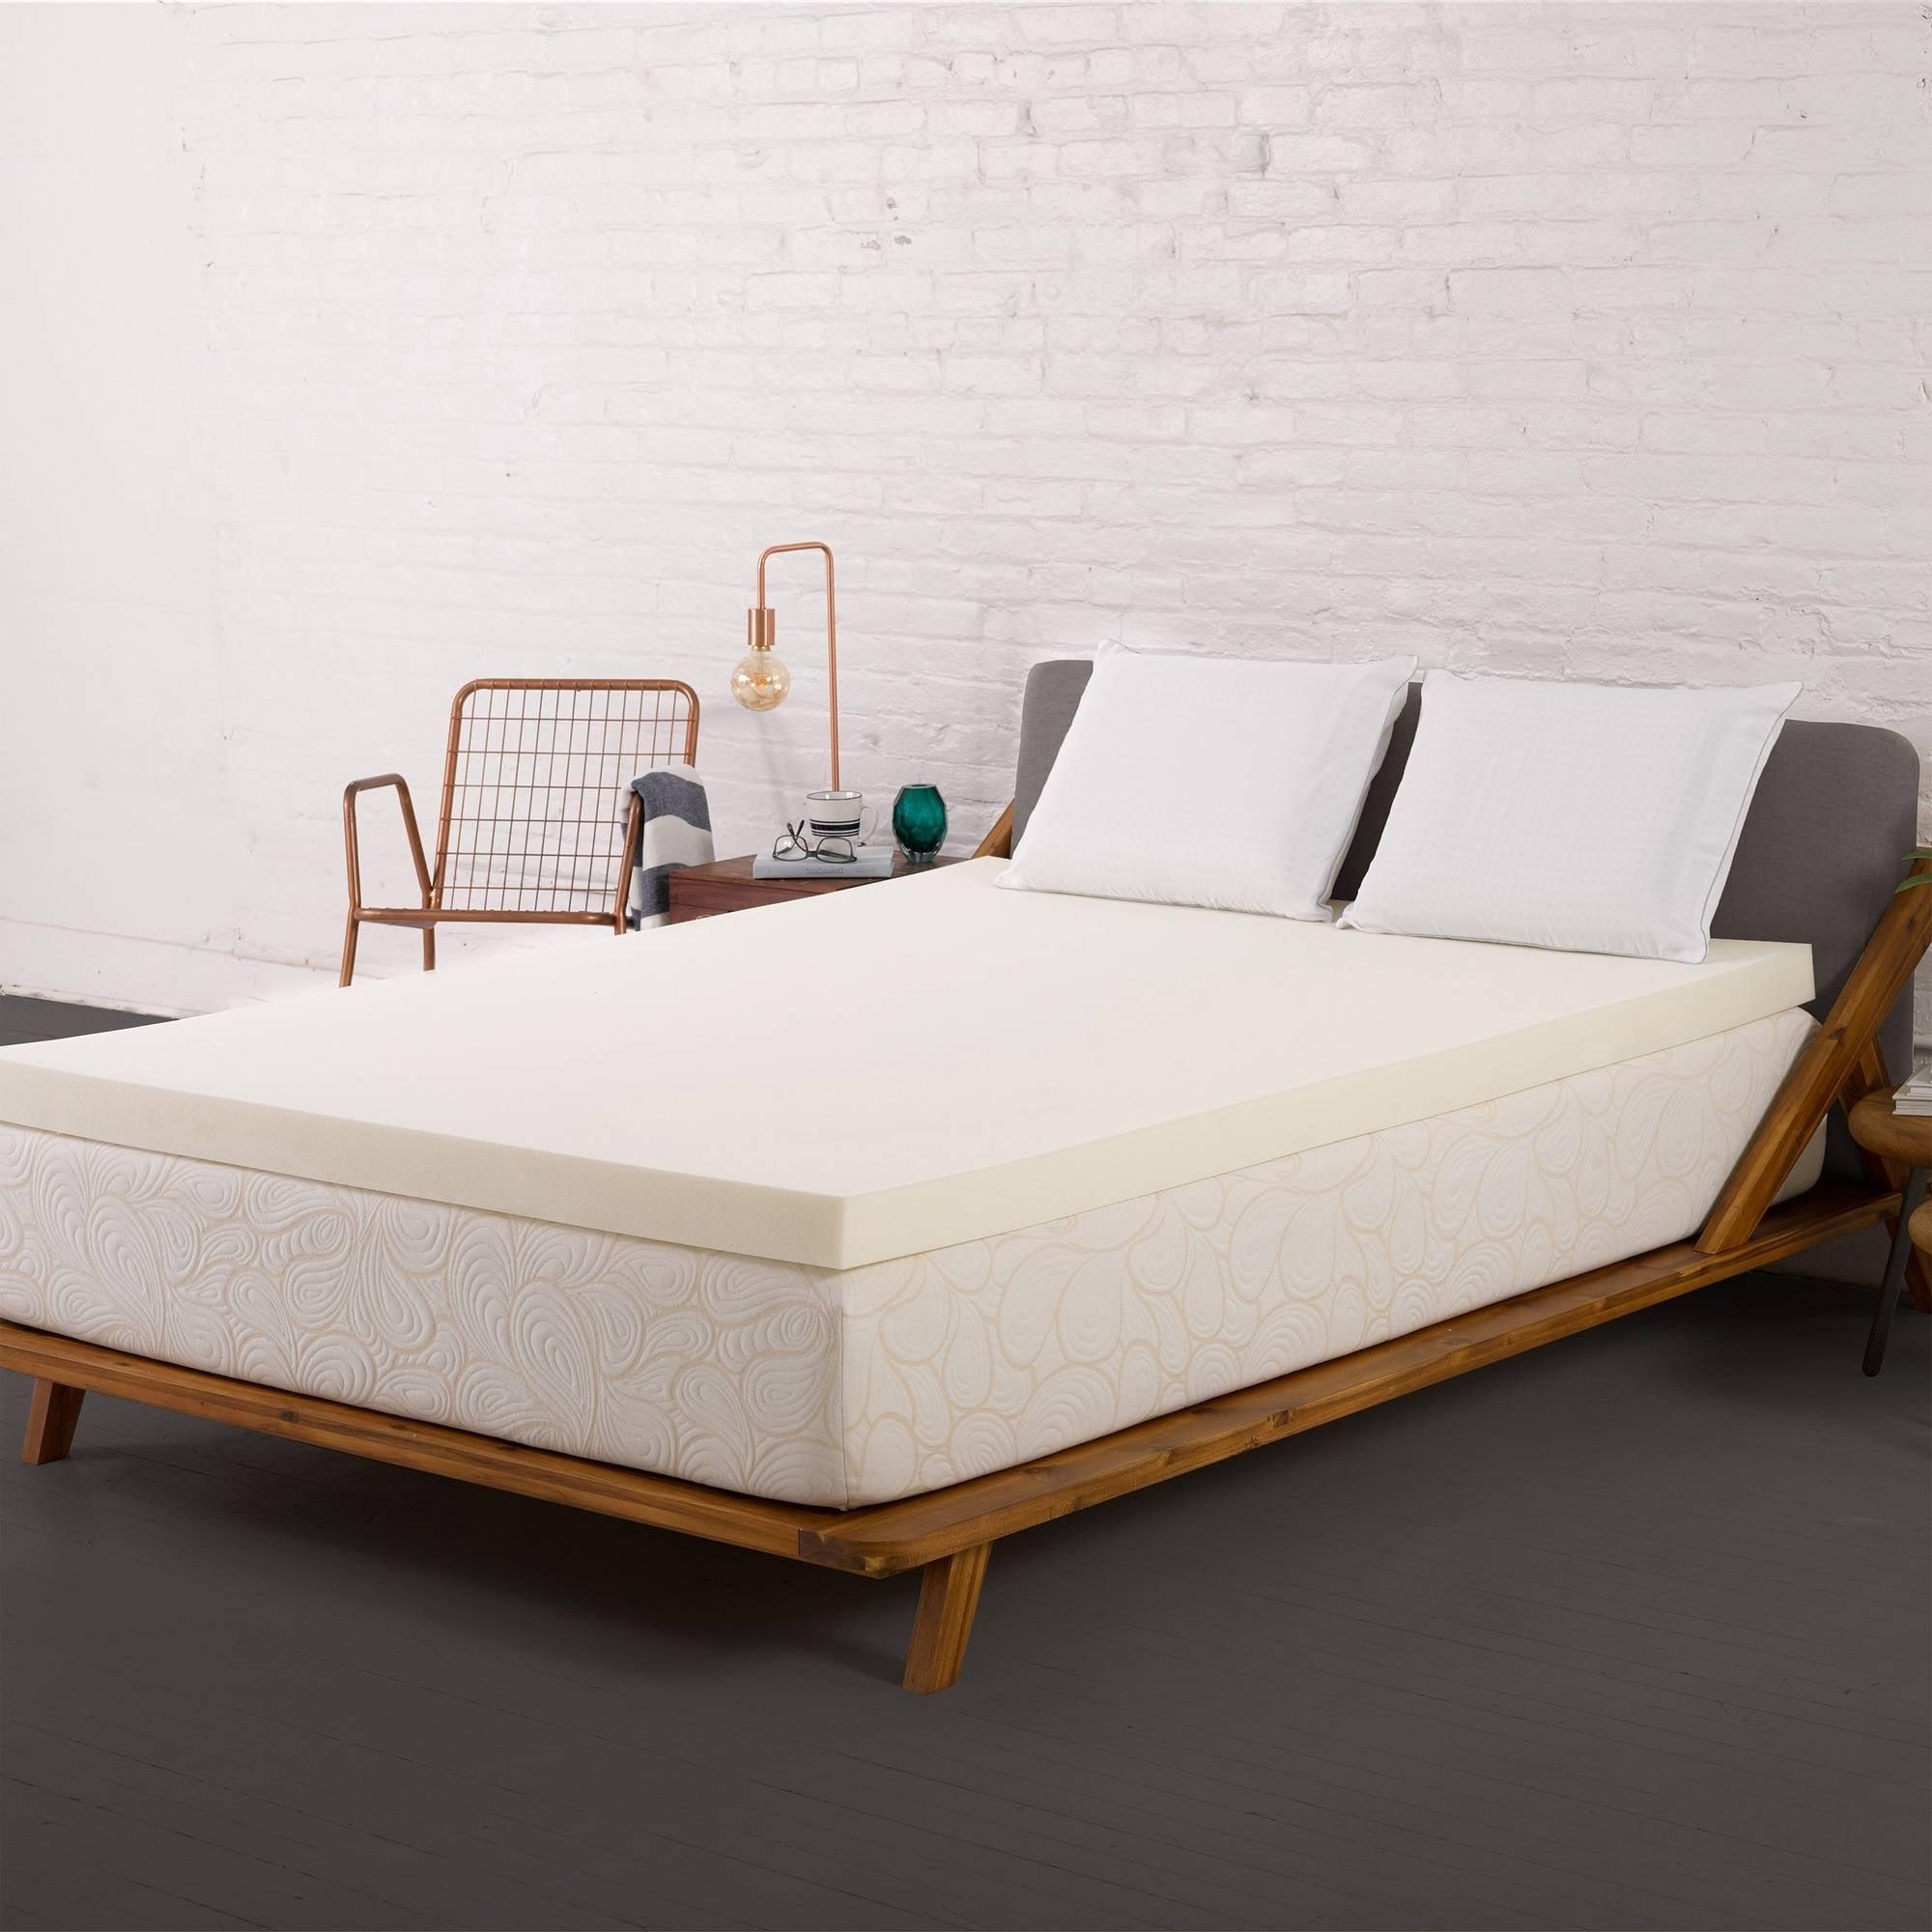 Authentic Comfort 3-Inch Memory Foam Mattress Topper